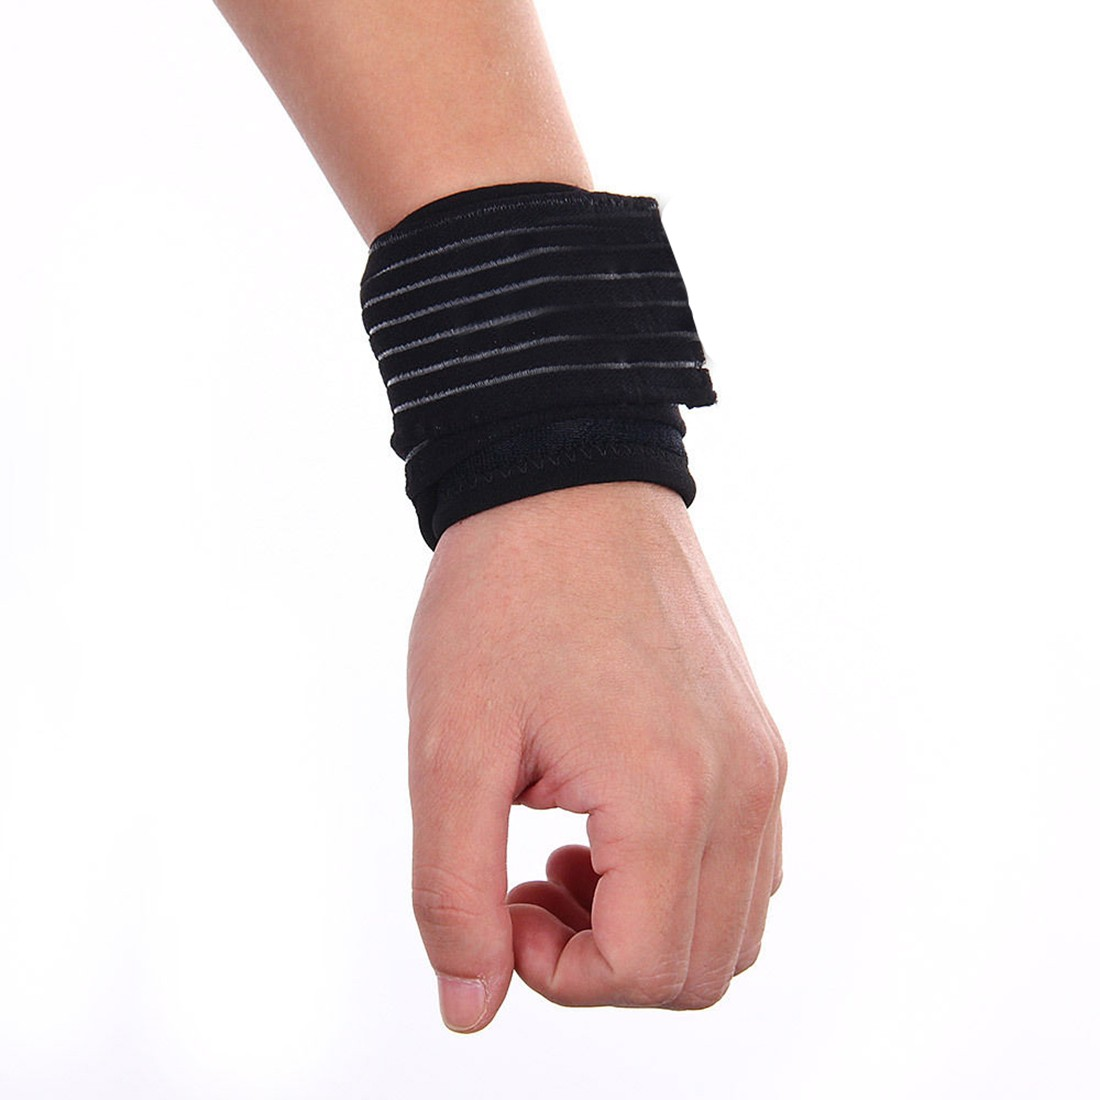 Badminton Gym Stretchy Cotton Wrist Brace Hand Wrist Straps Sport Wristbands Support Wrist Protector Carpal Tunnel Bracer